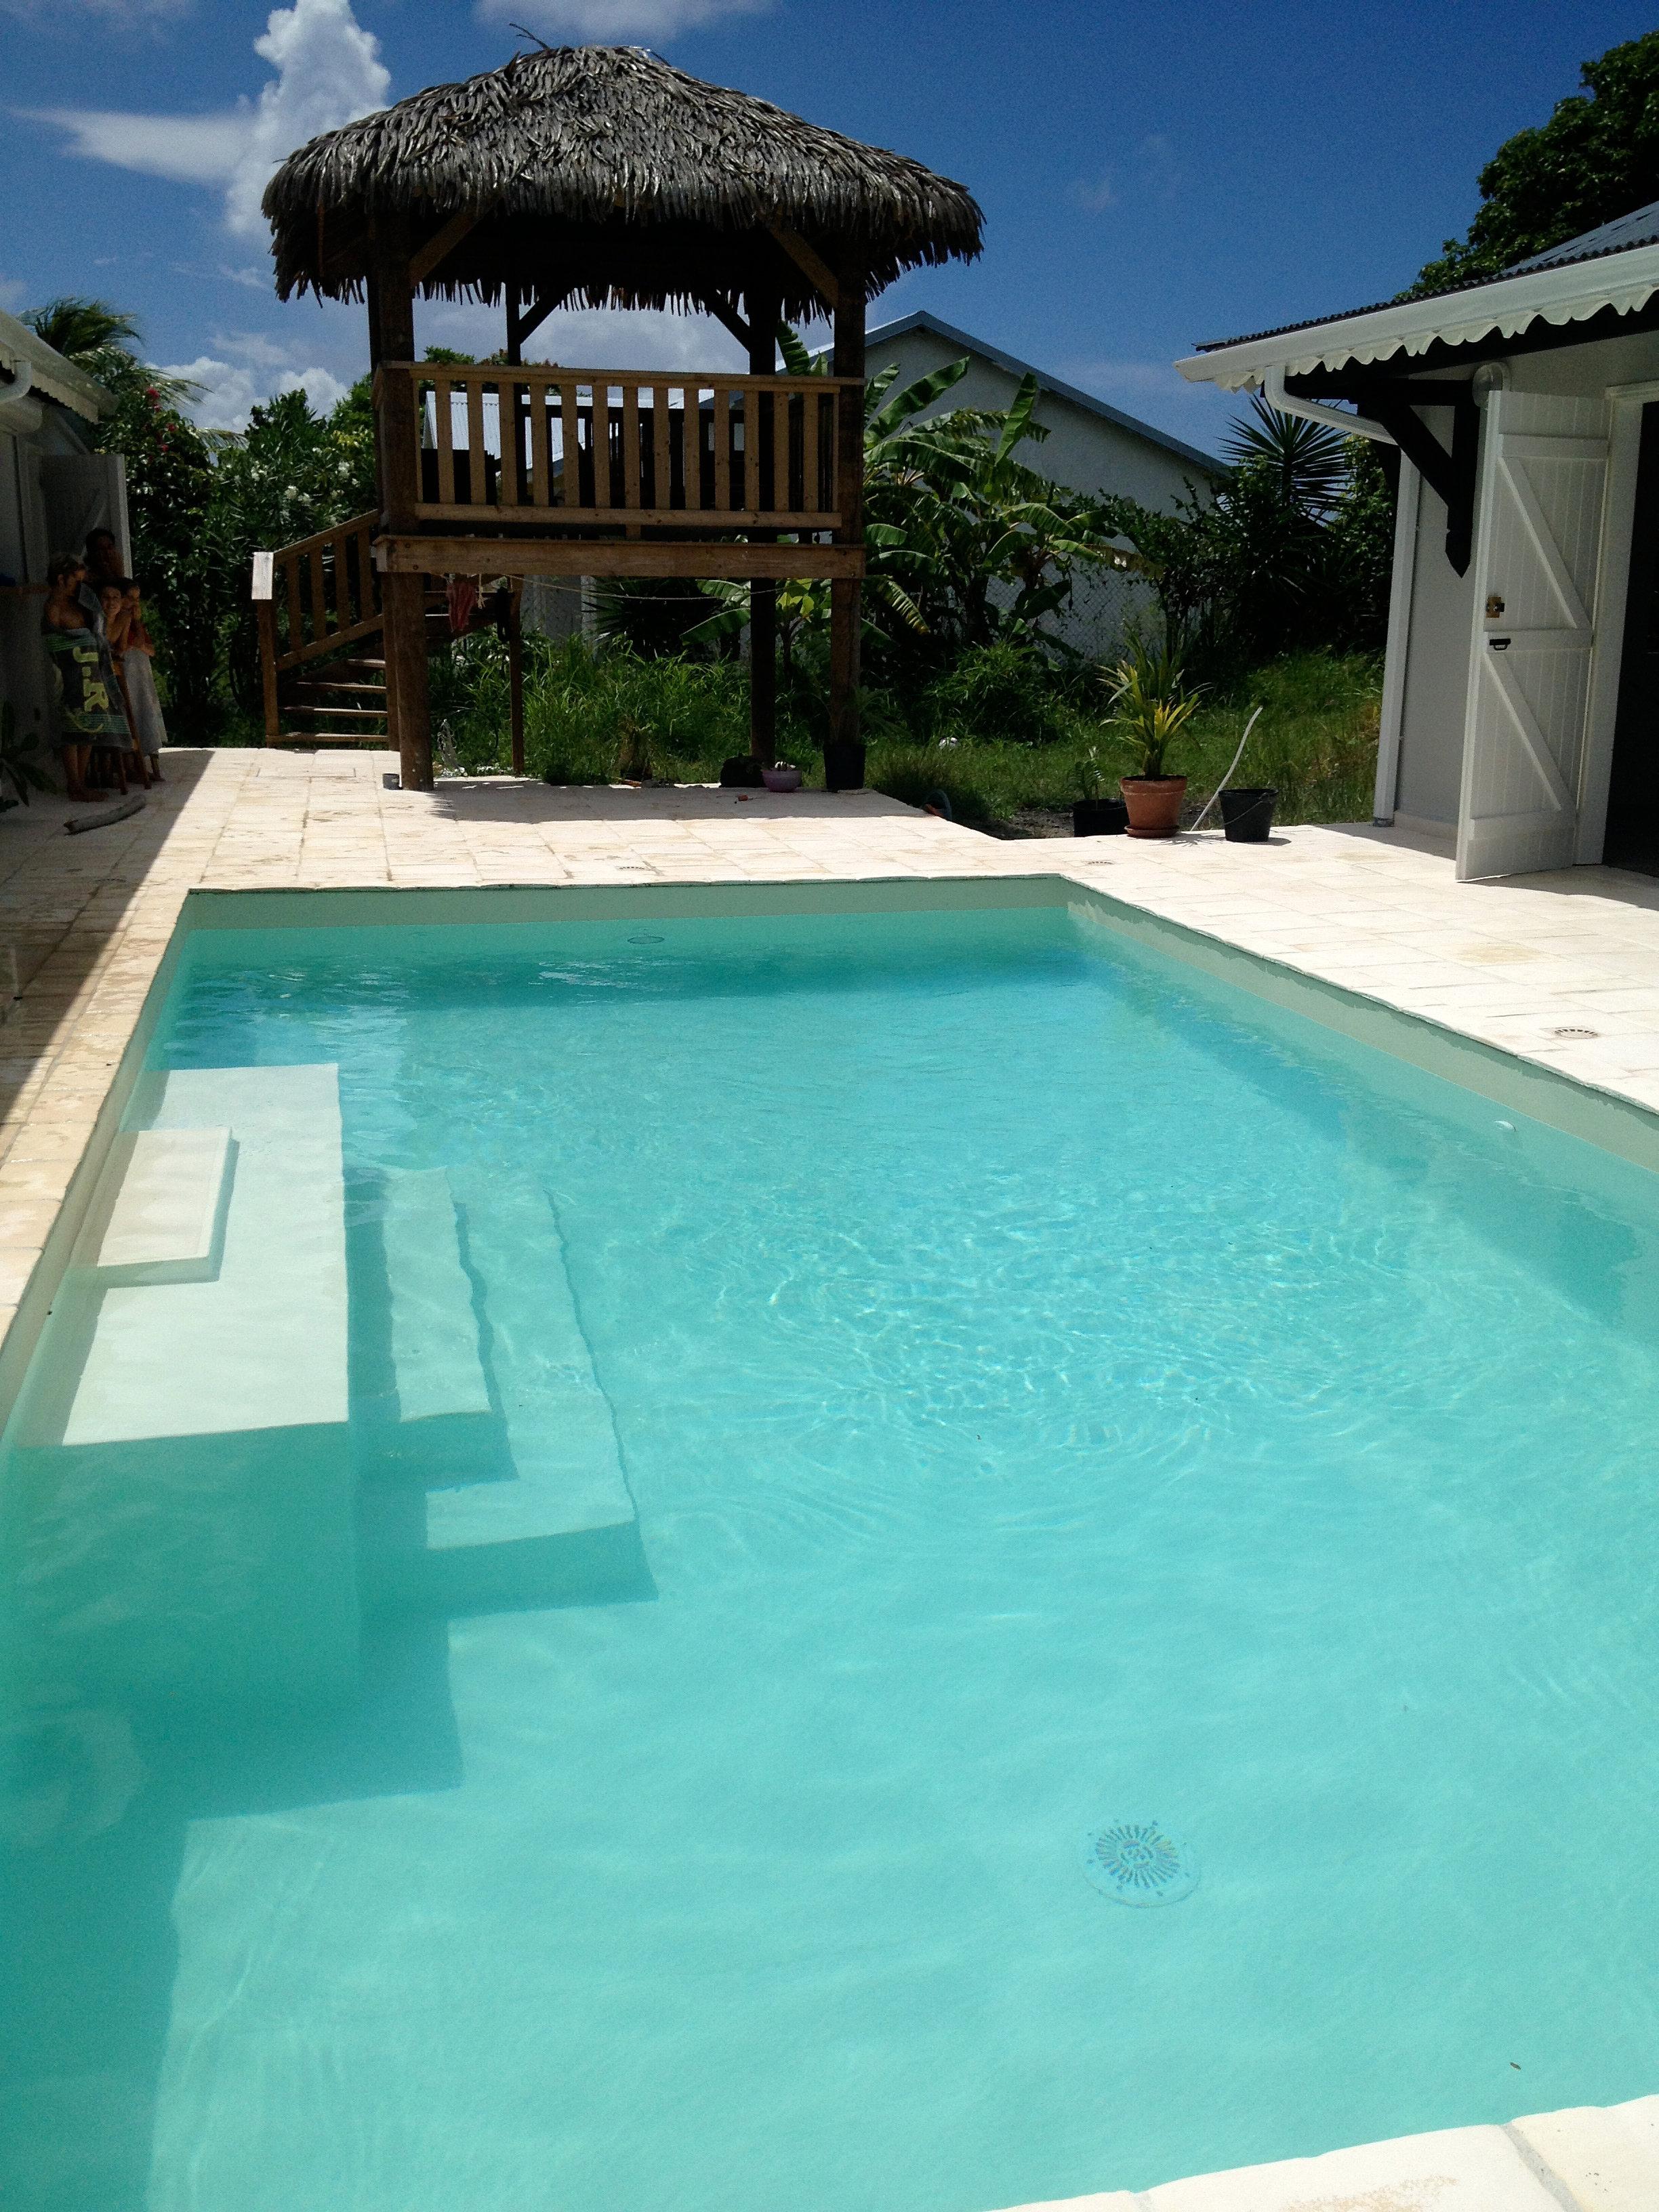 Piscine marie galante construction entretien piscine pvc for Piscine 3 05 x 1 22